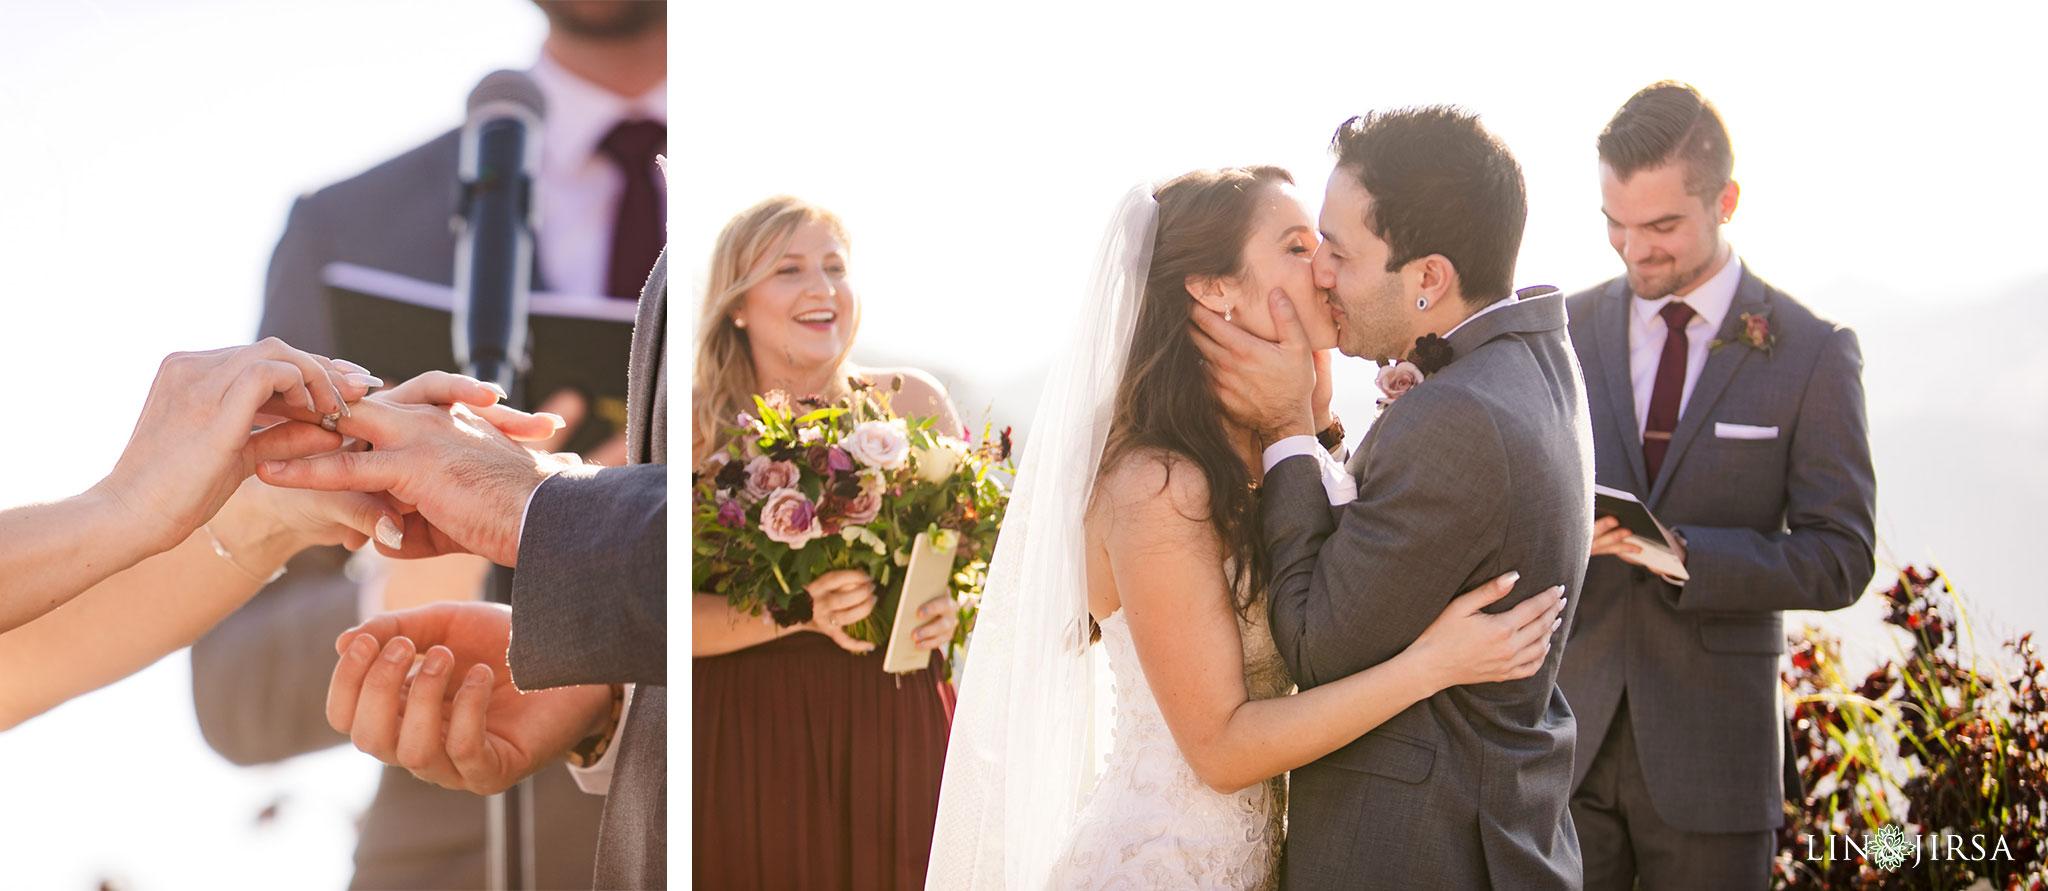 019 malibu rocky oaks wedding photography